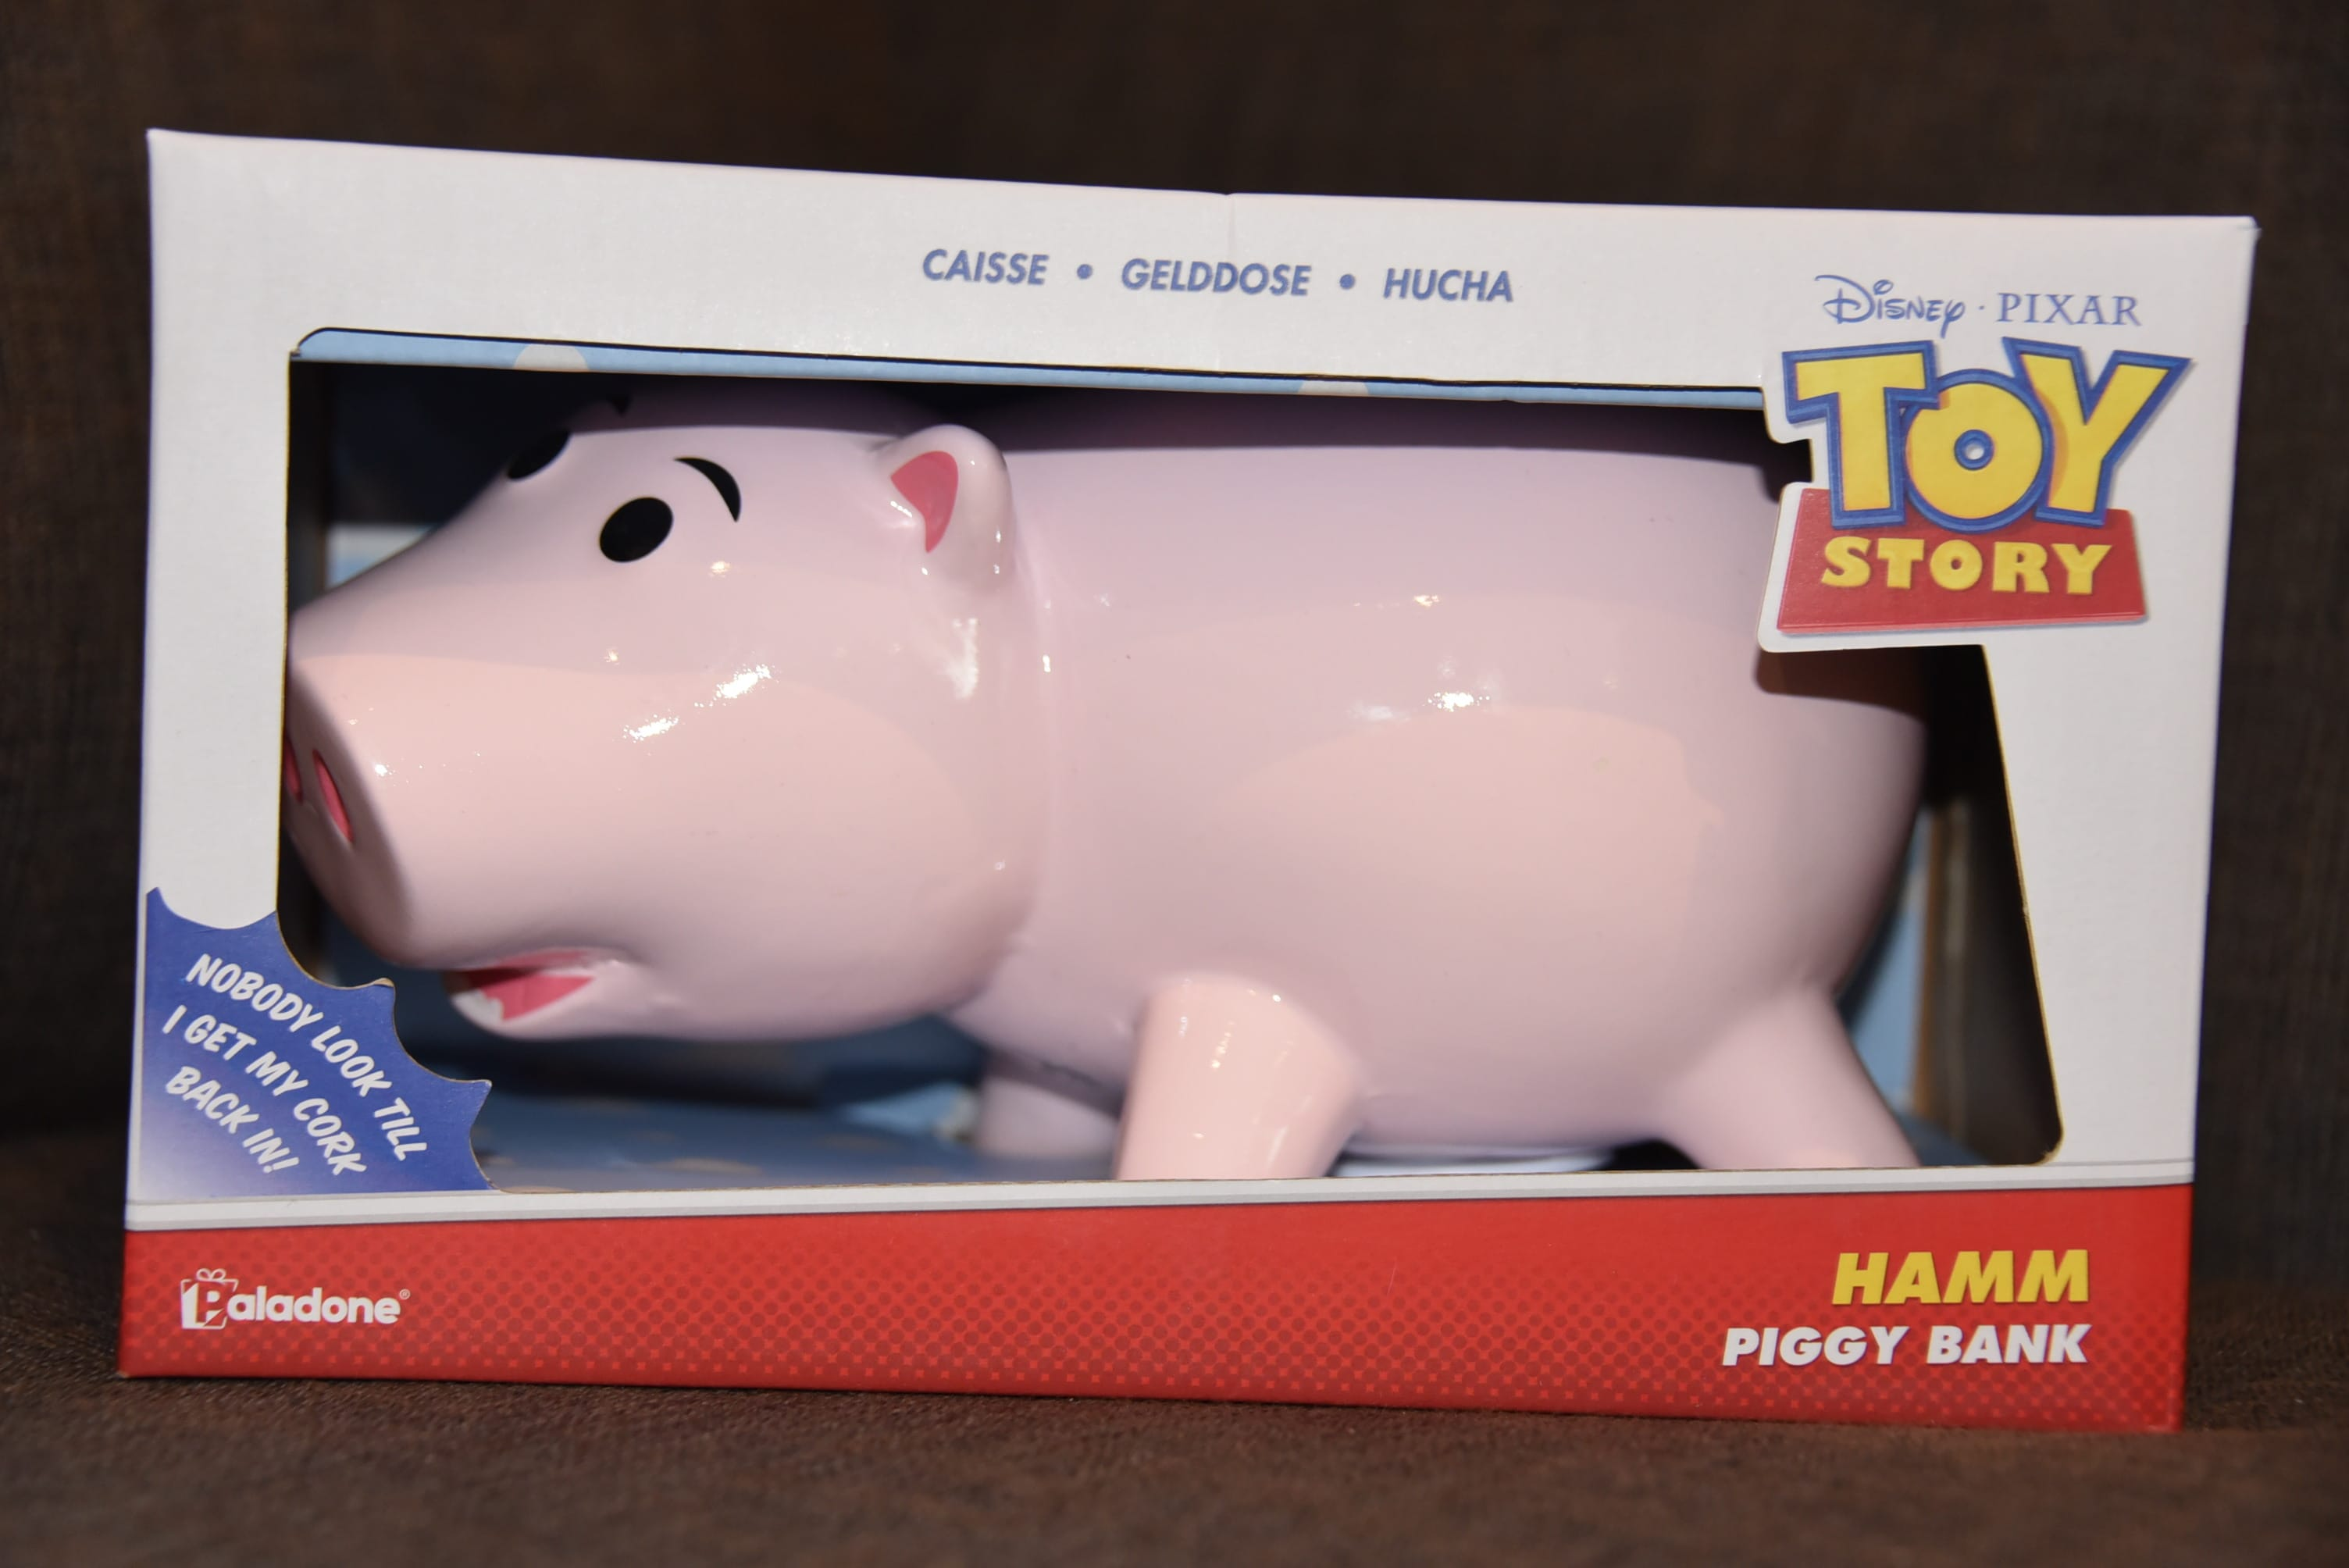 New Disney Pixar Toy Story Hamm Piggy Bank with real cork plug